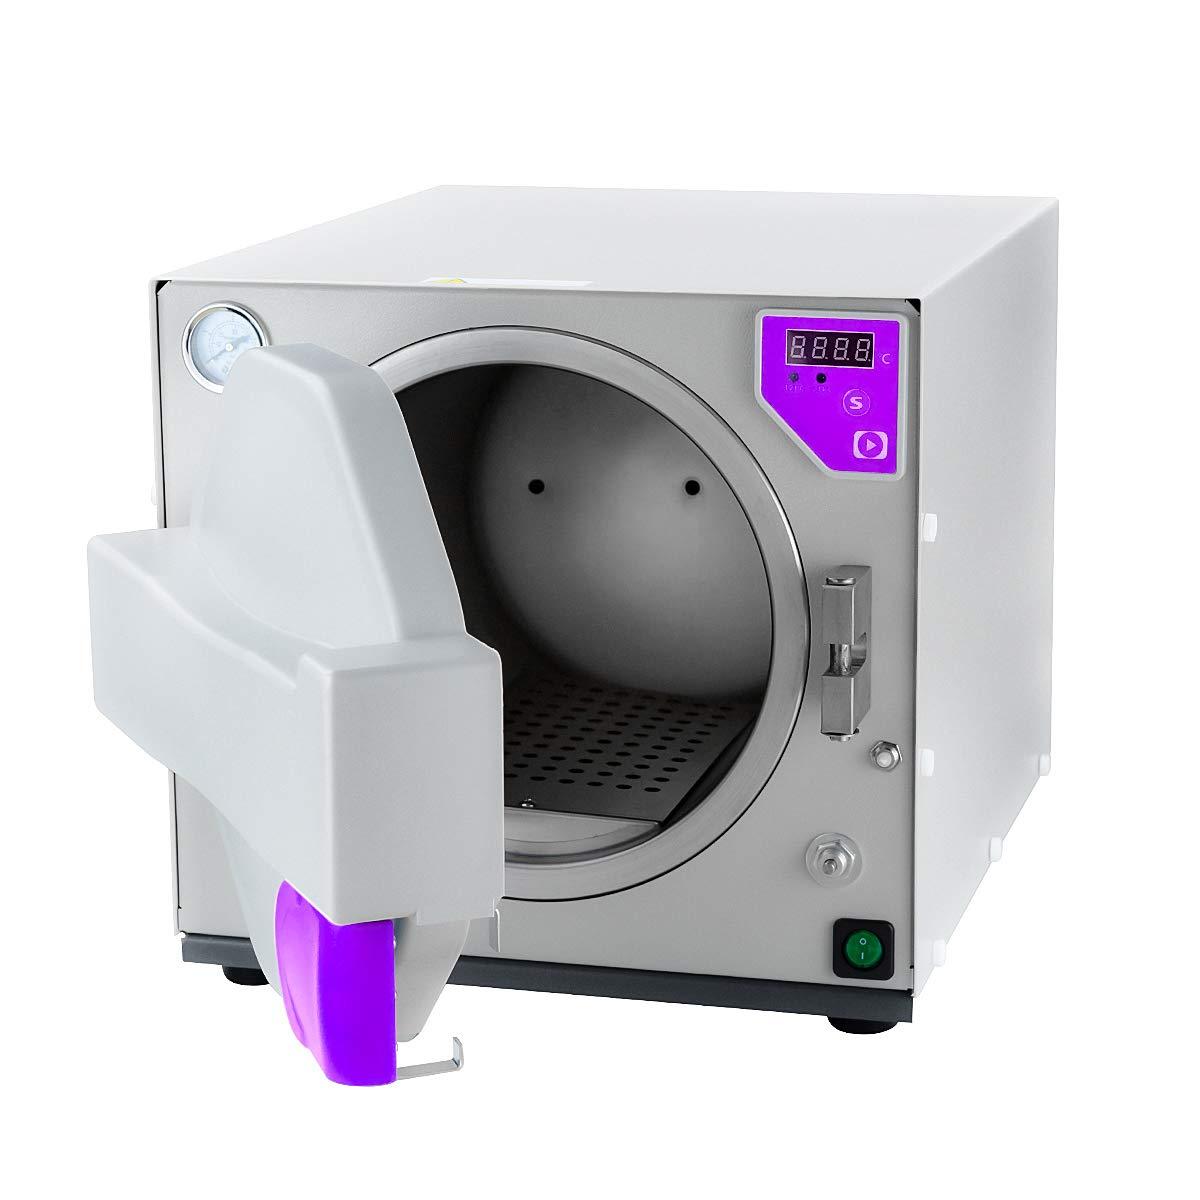 BONEW 18L Autoclave Steam Dental Lab Equipment Tool Mini330 by BONEW (Image #6)